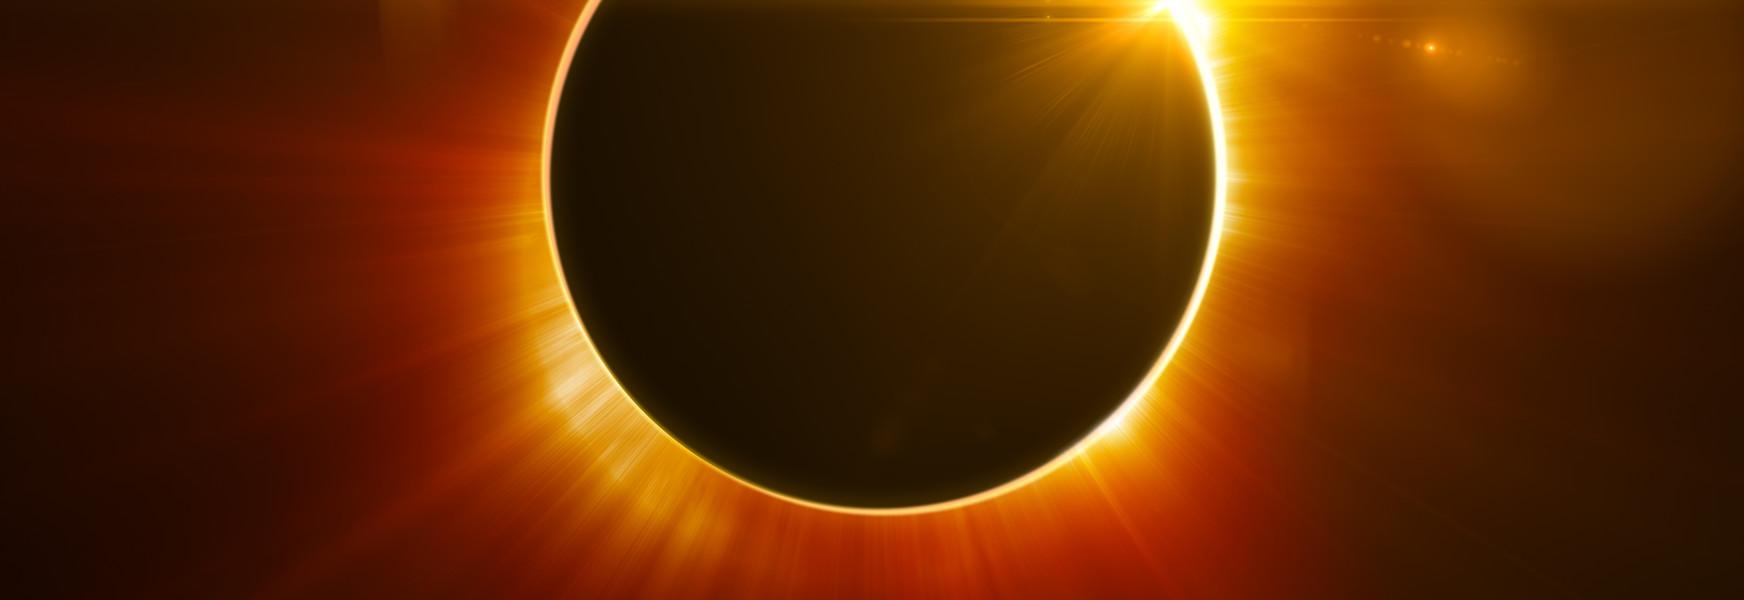 solar ecliipse